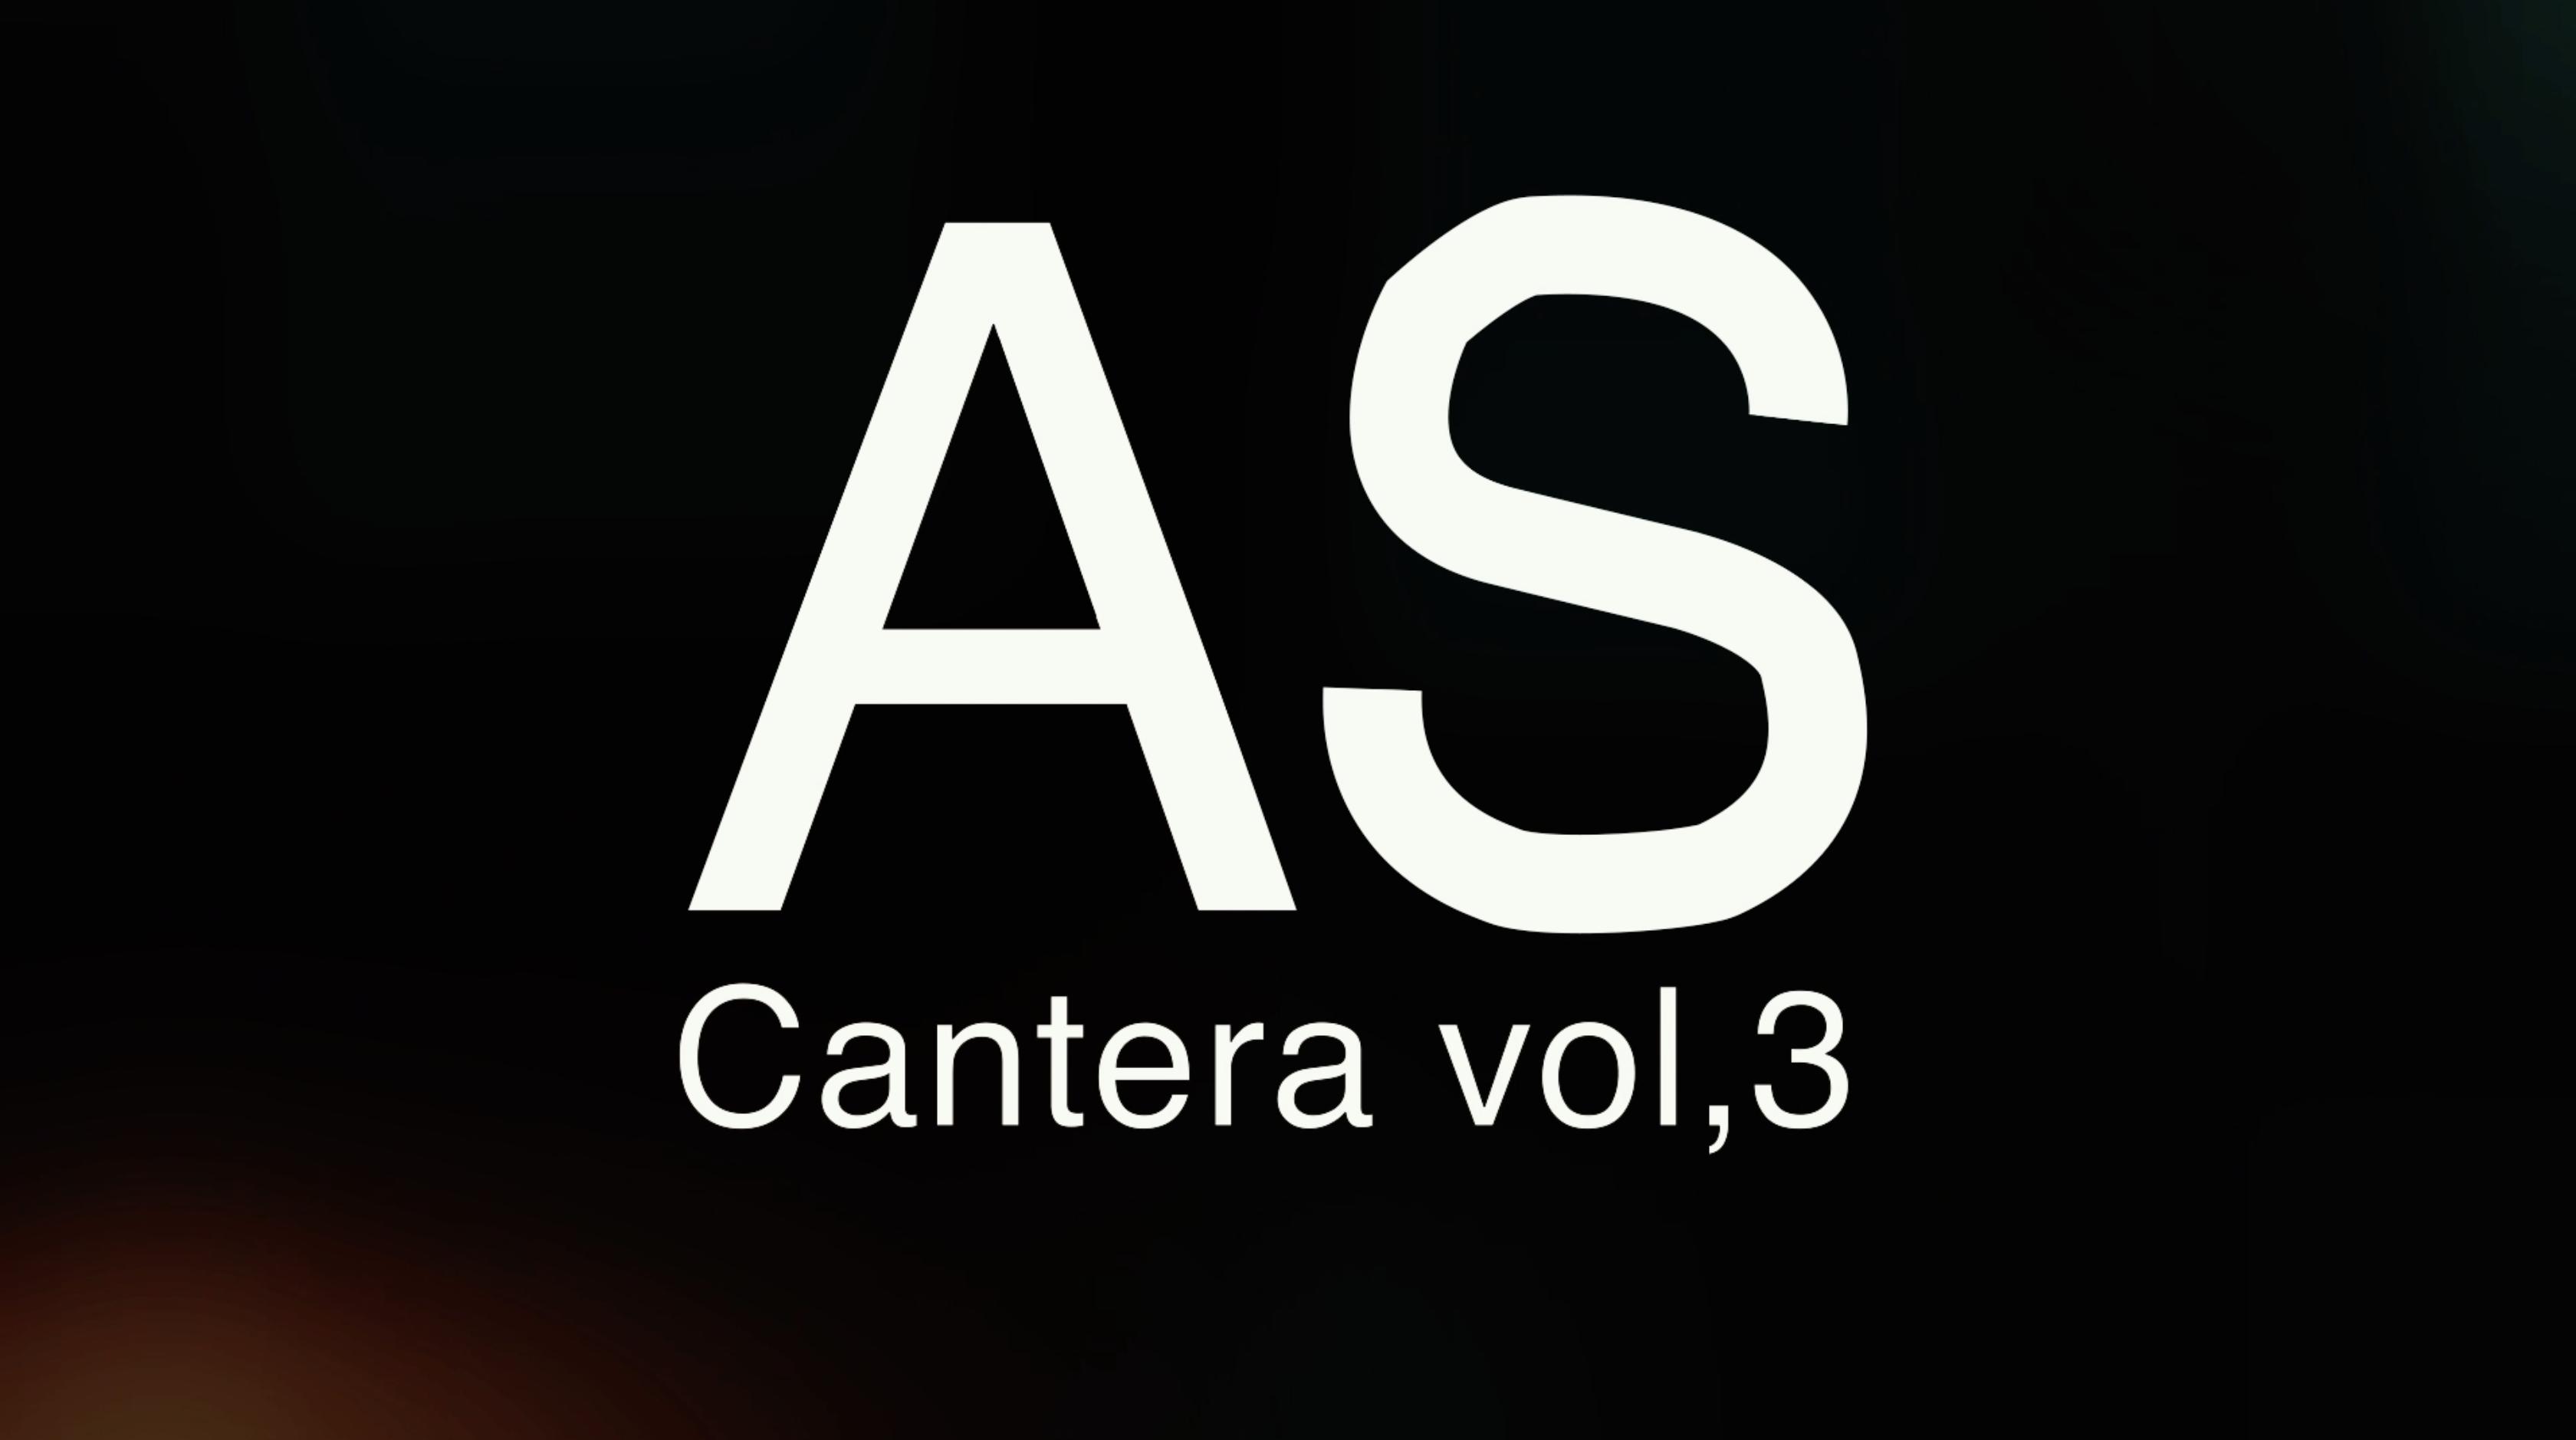 AS Cantera vol,3」オープニング、アタック、エンディング映像